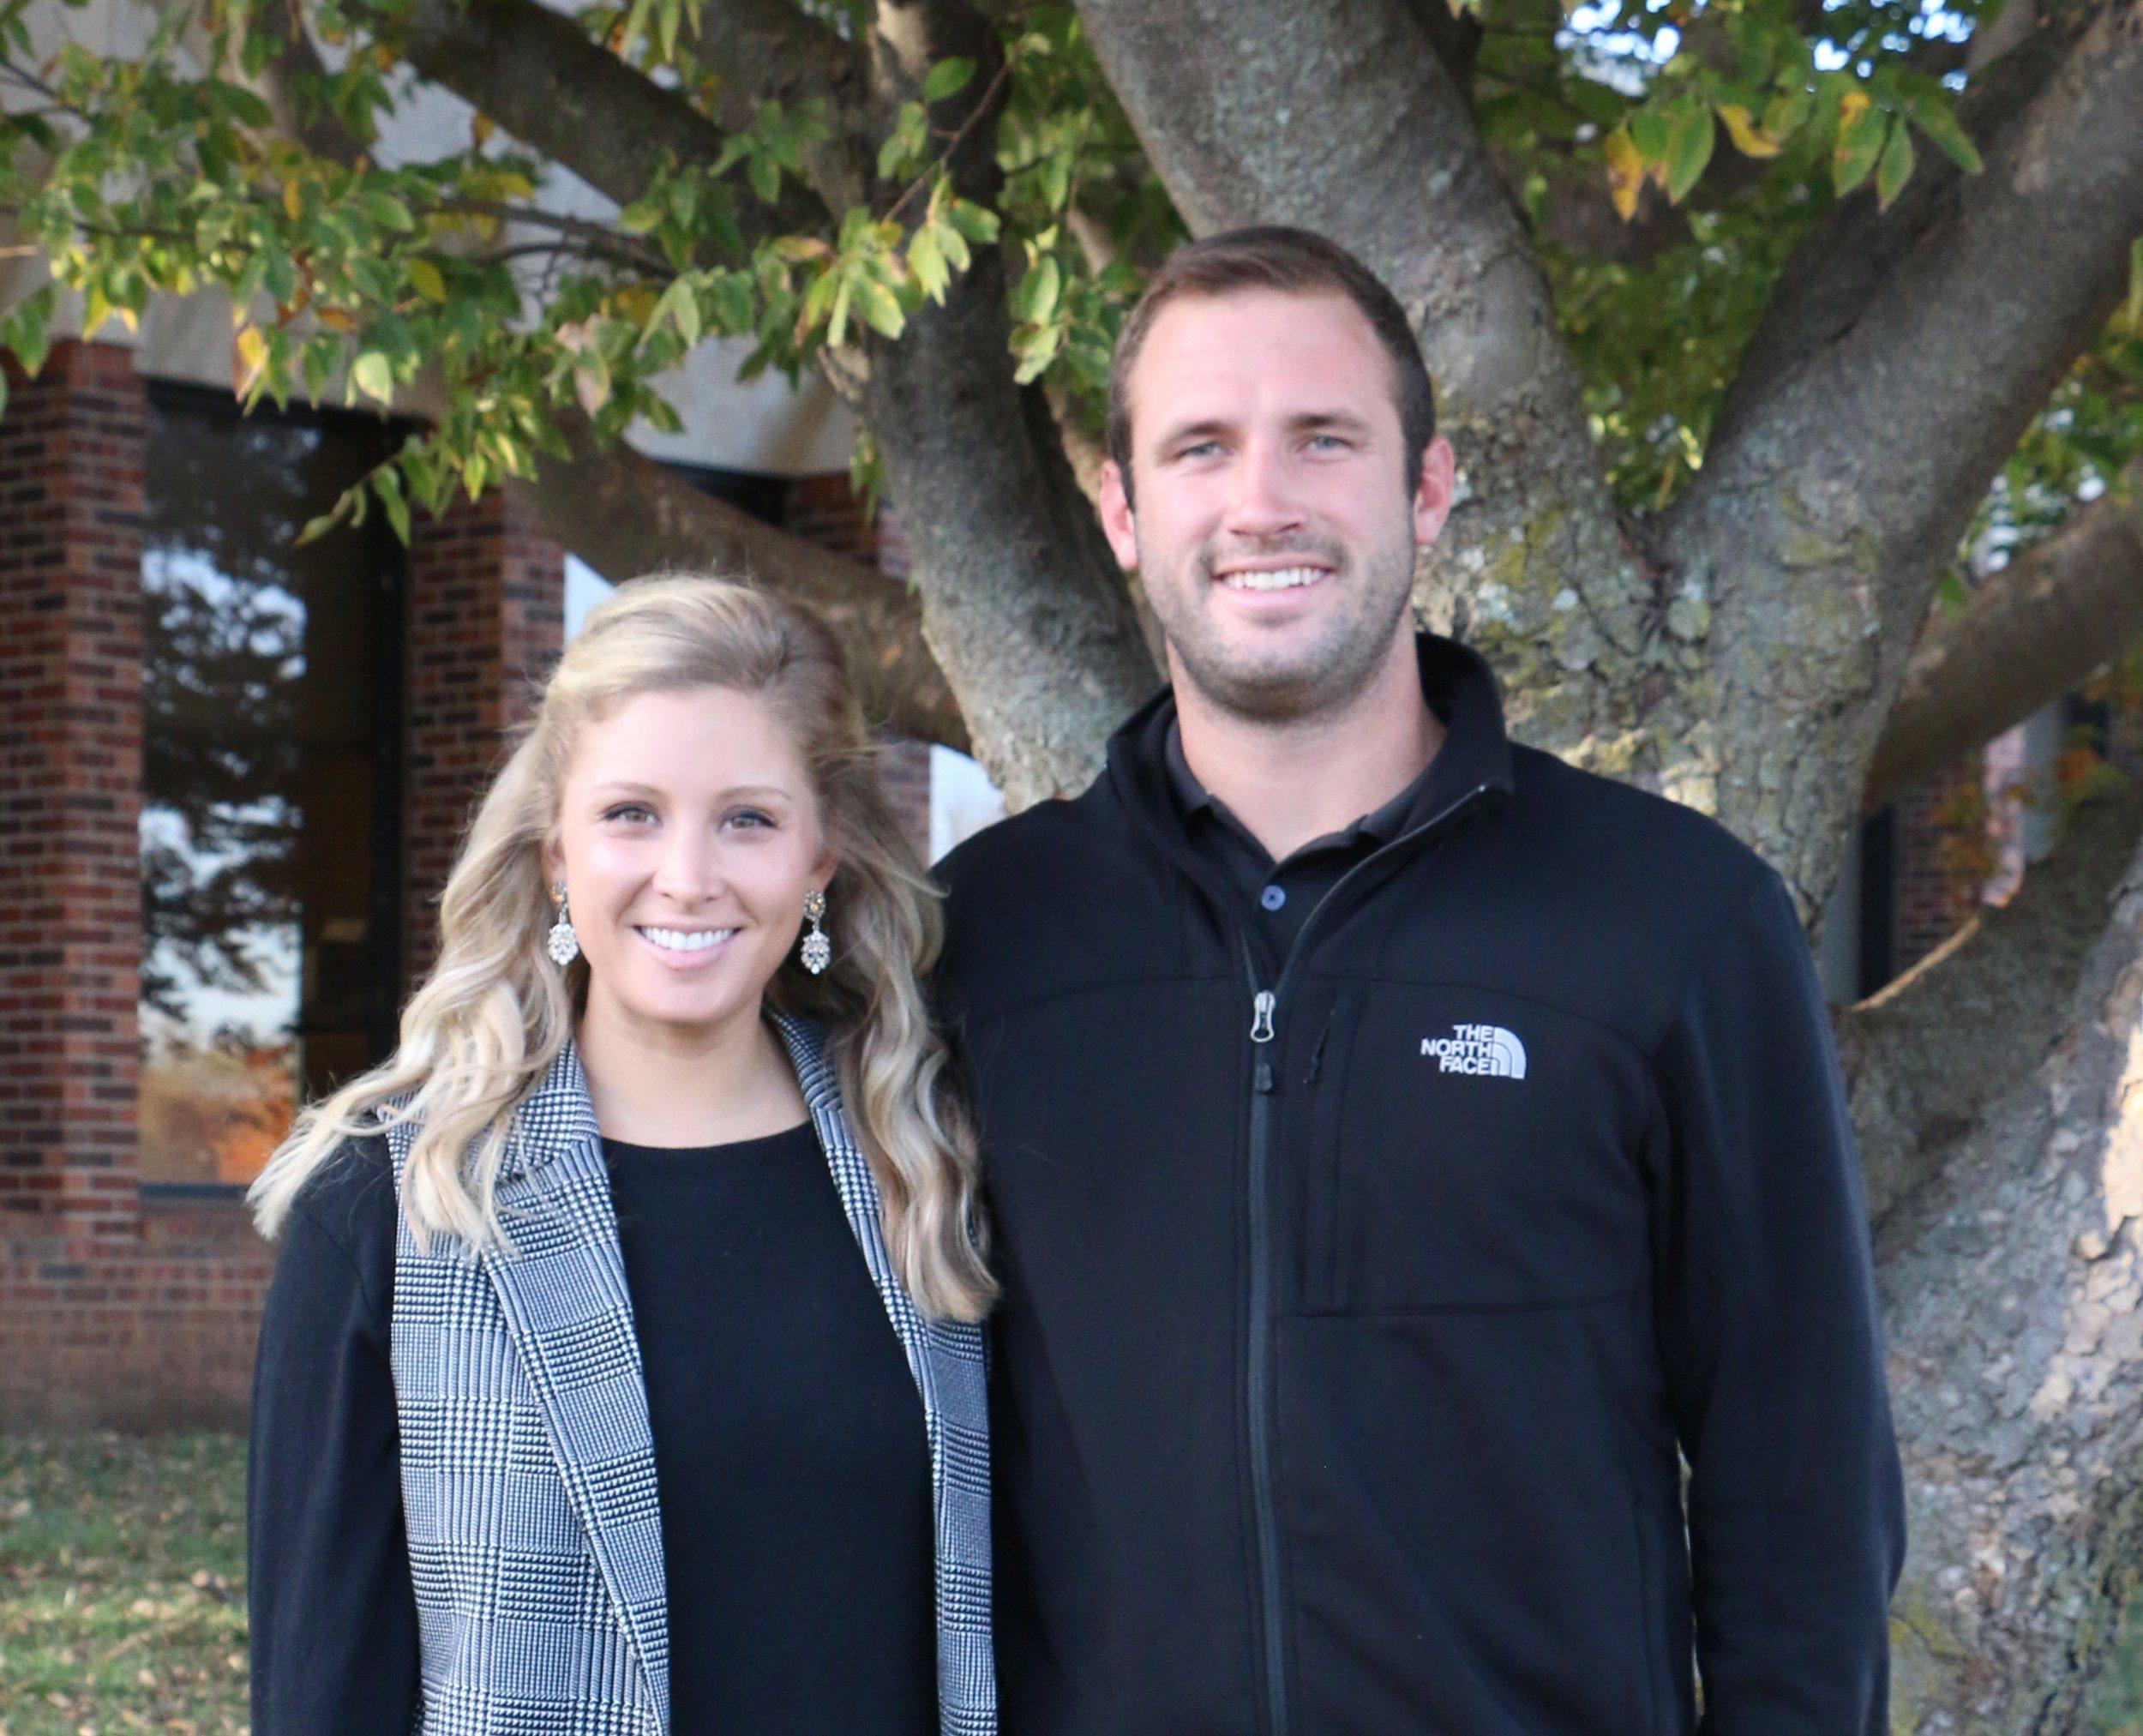 FSCC Head Football Coach Kale Pick poses with his wife, Geneva.